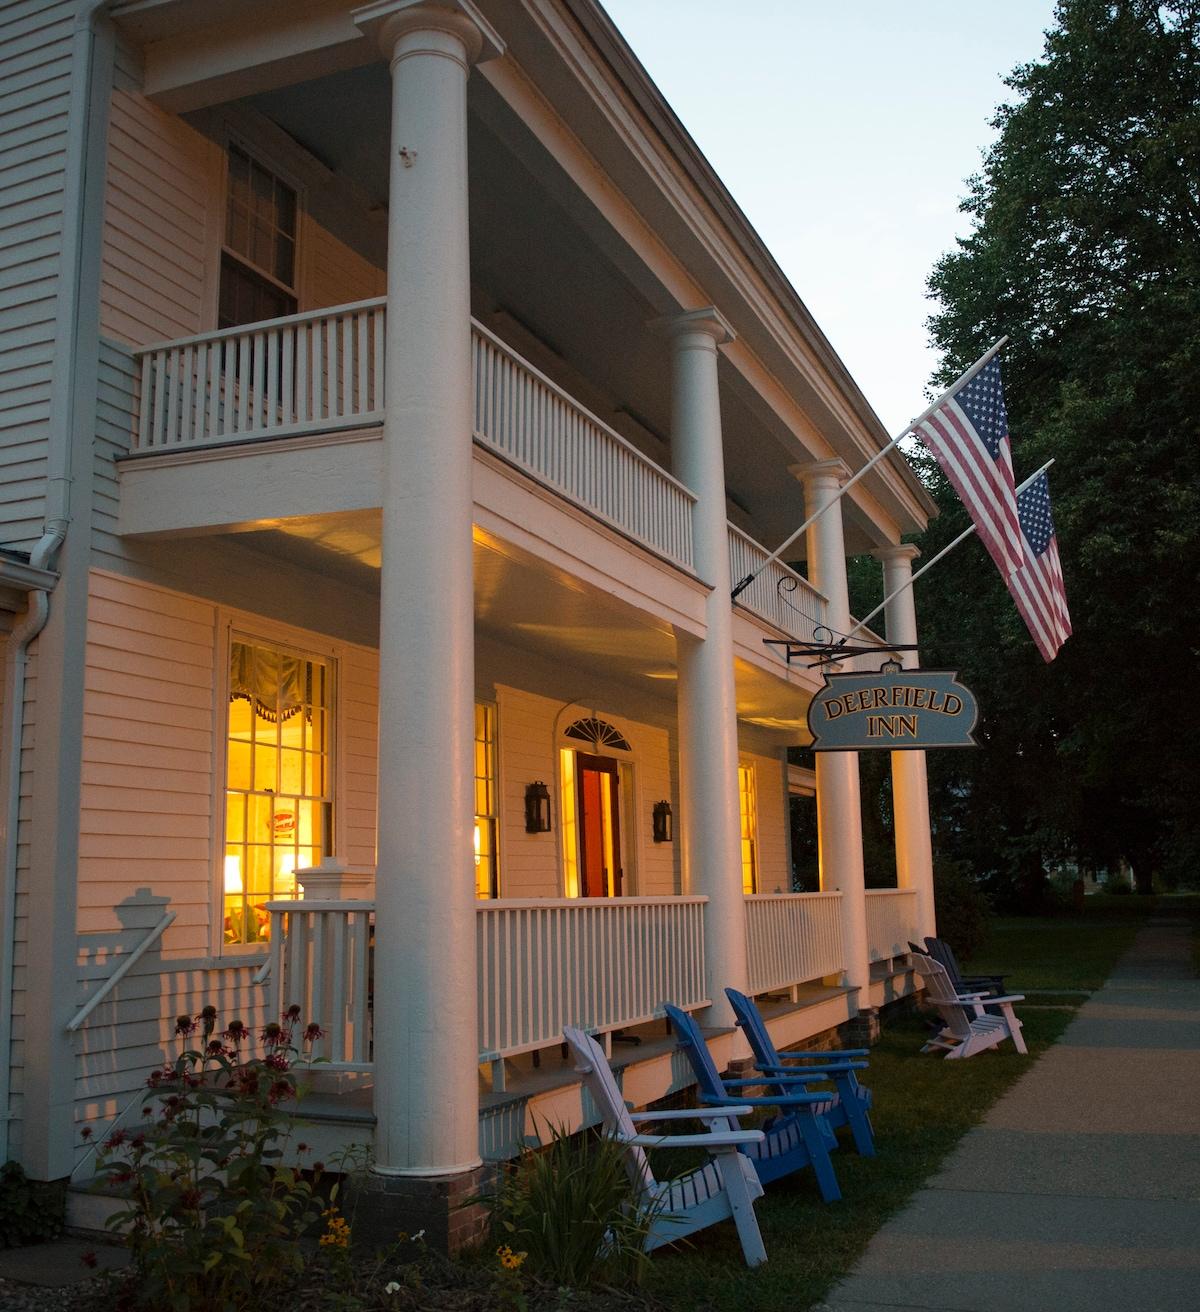 Rural Haven in Deerfield, MA